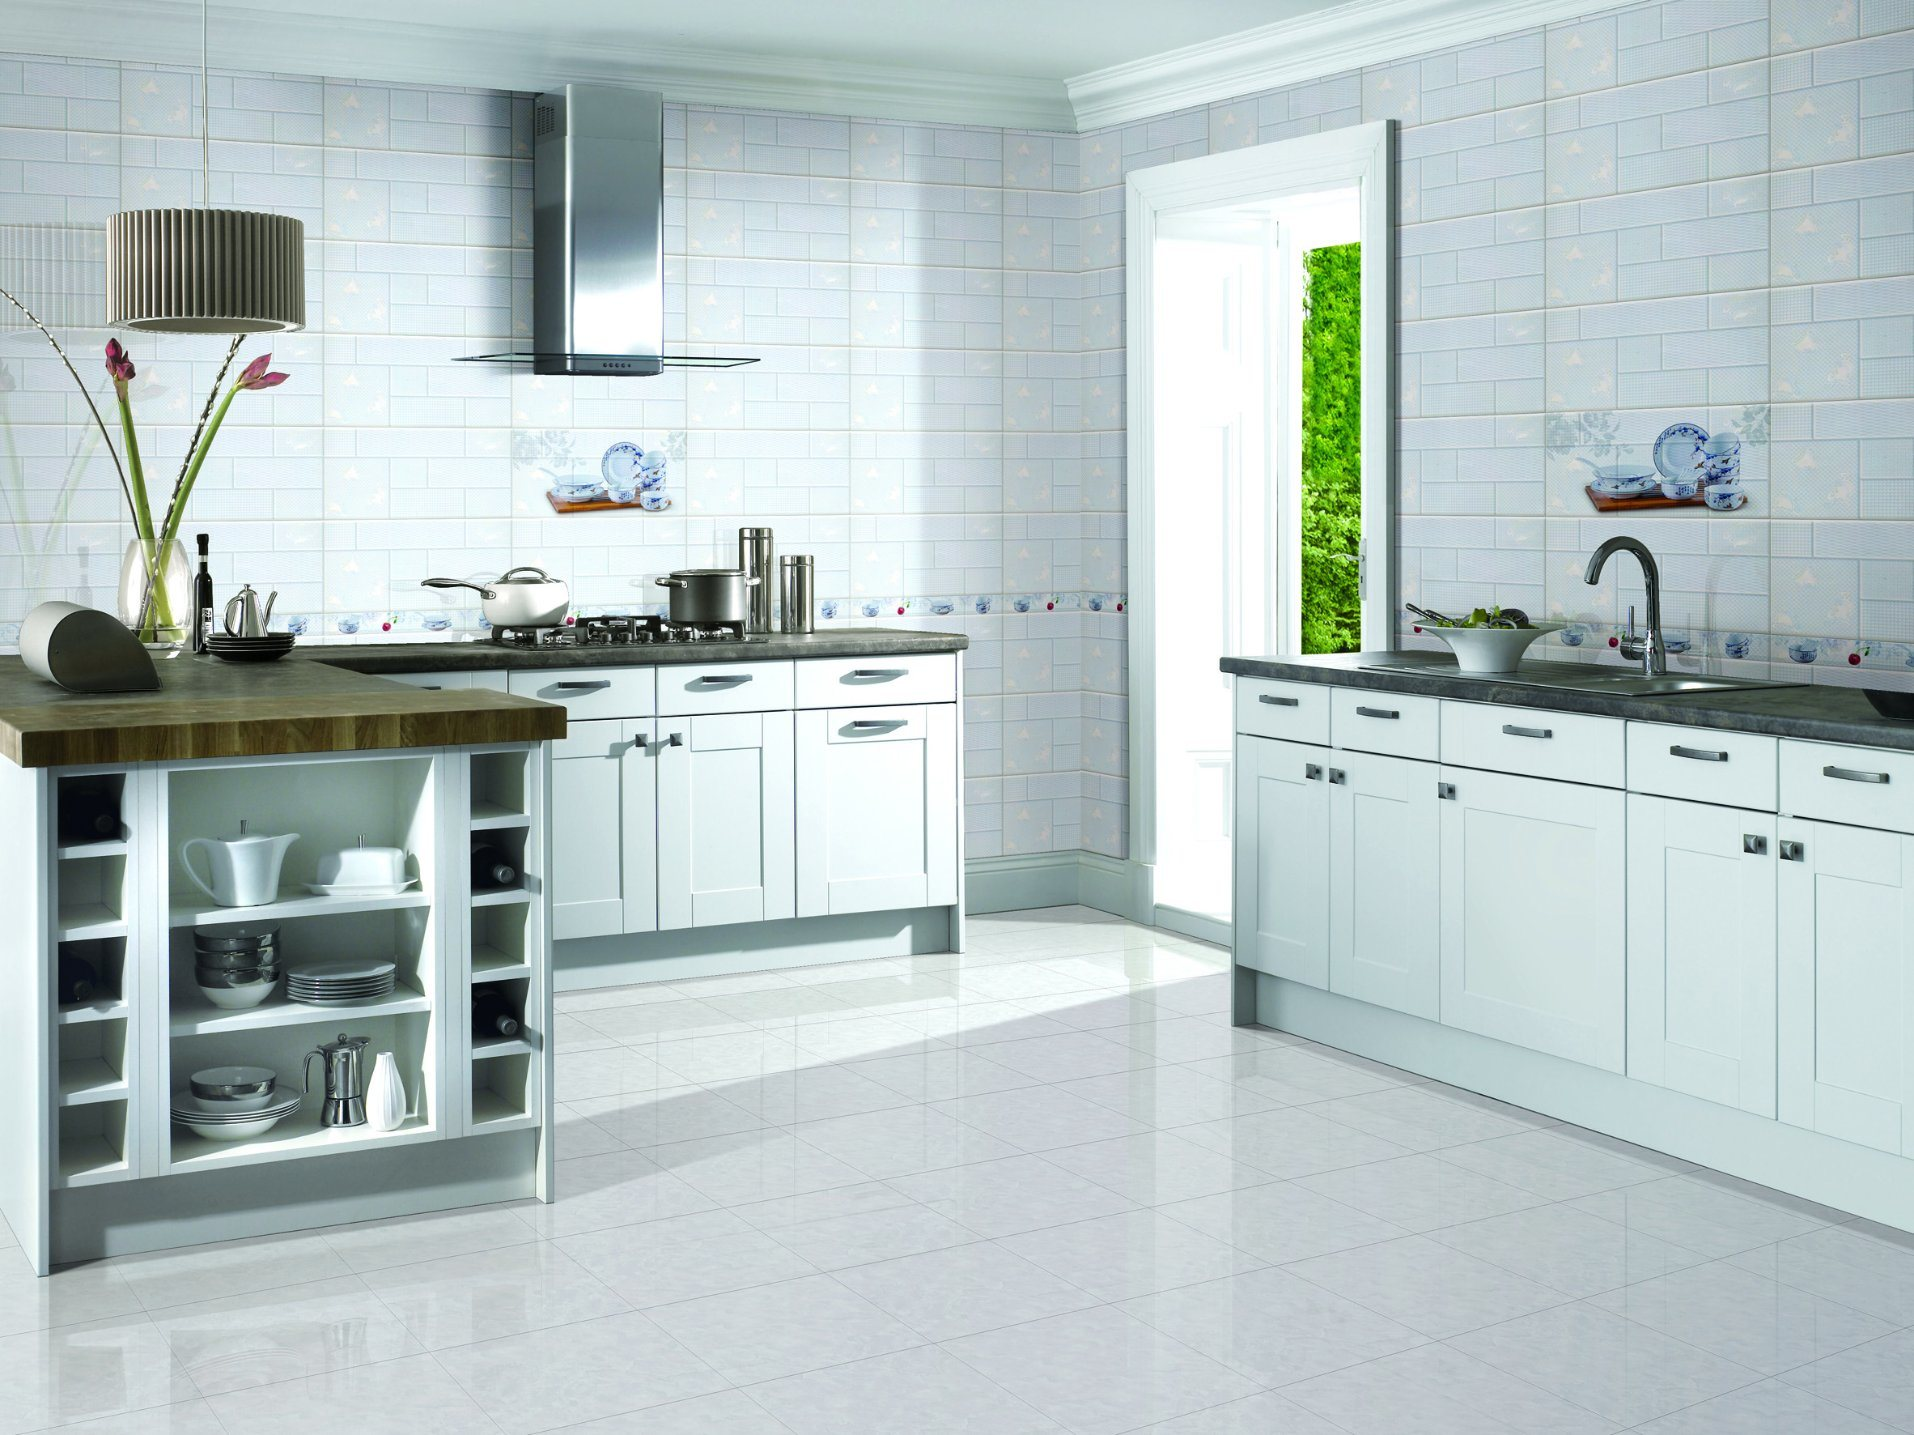 China 3D Inkjet Ceramic Floor Tile Wall Tile for Home Decoration ...